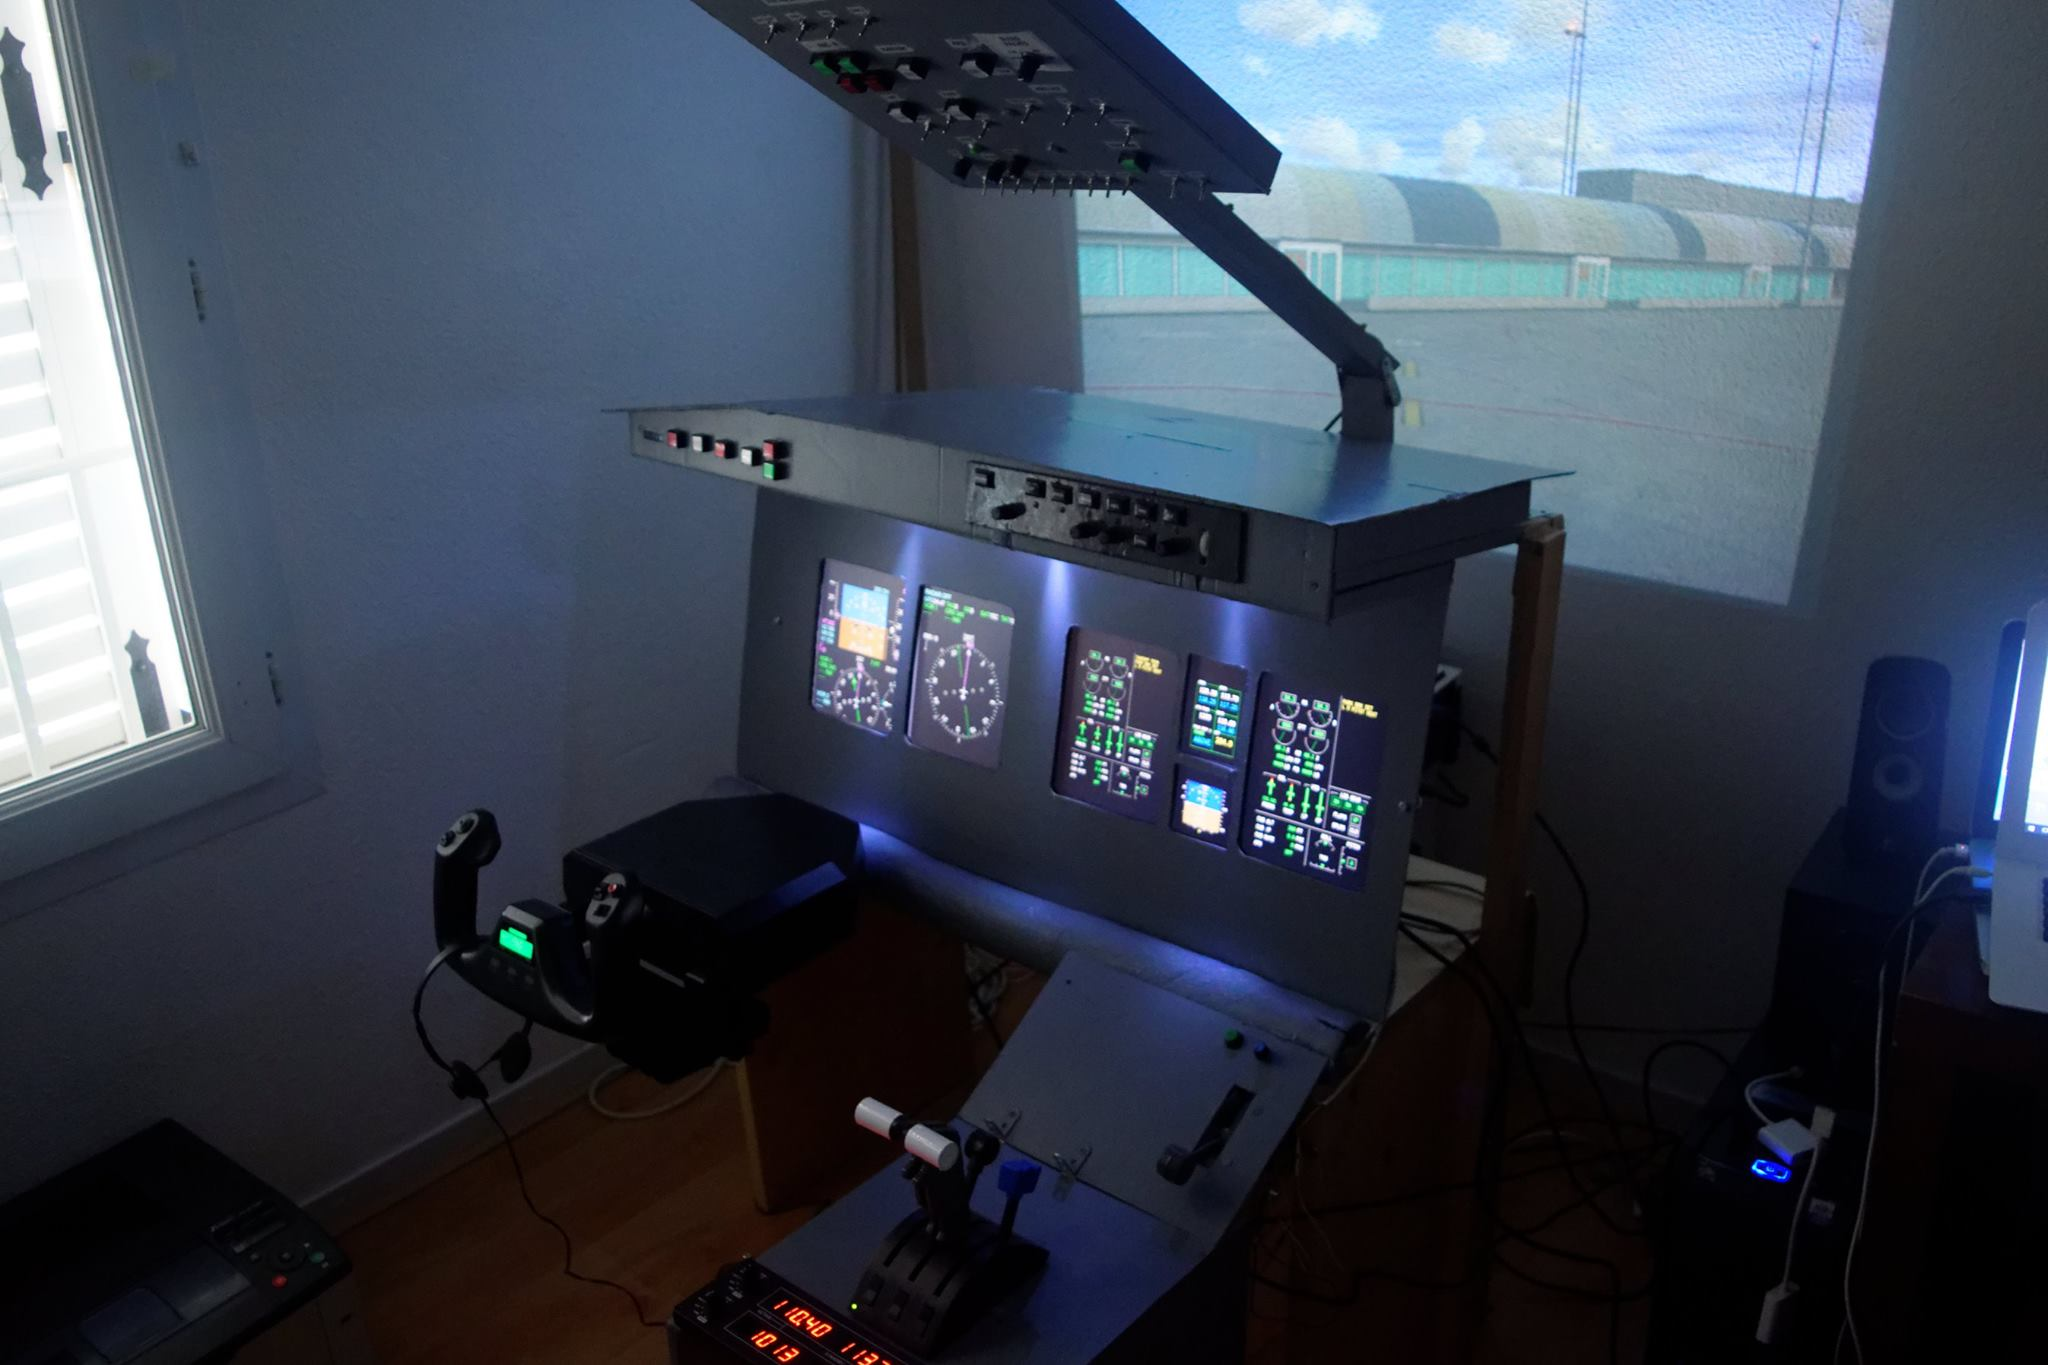 http://www.pilote-virtuel.com/img/gallery/1504481049.jpg